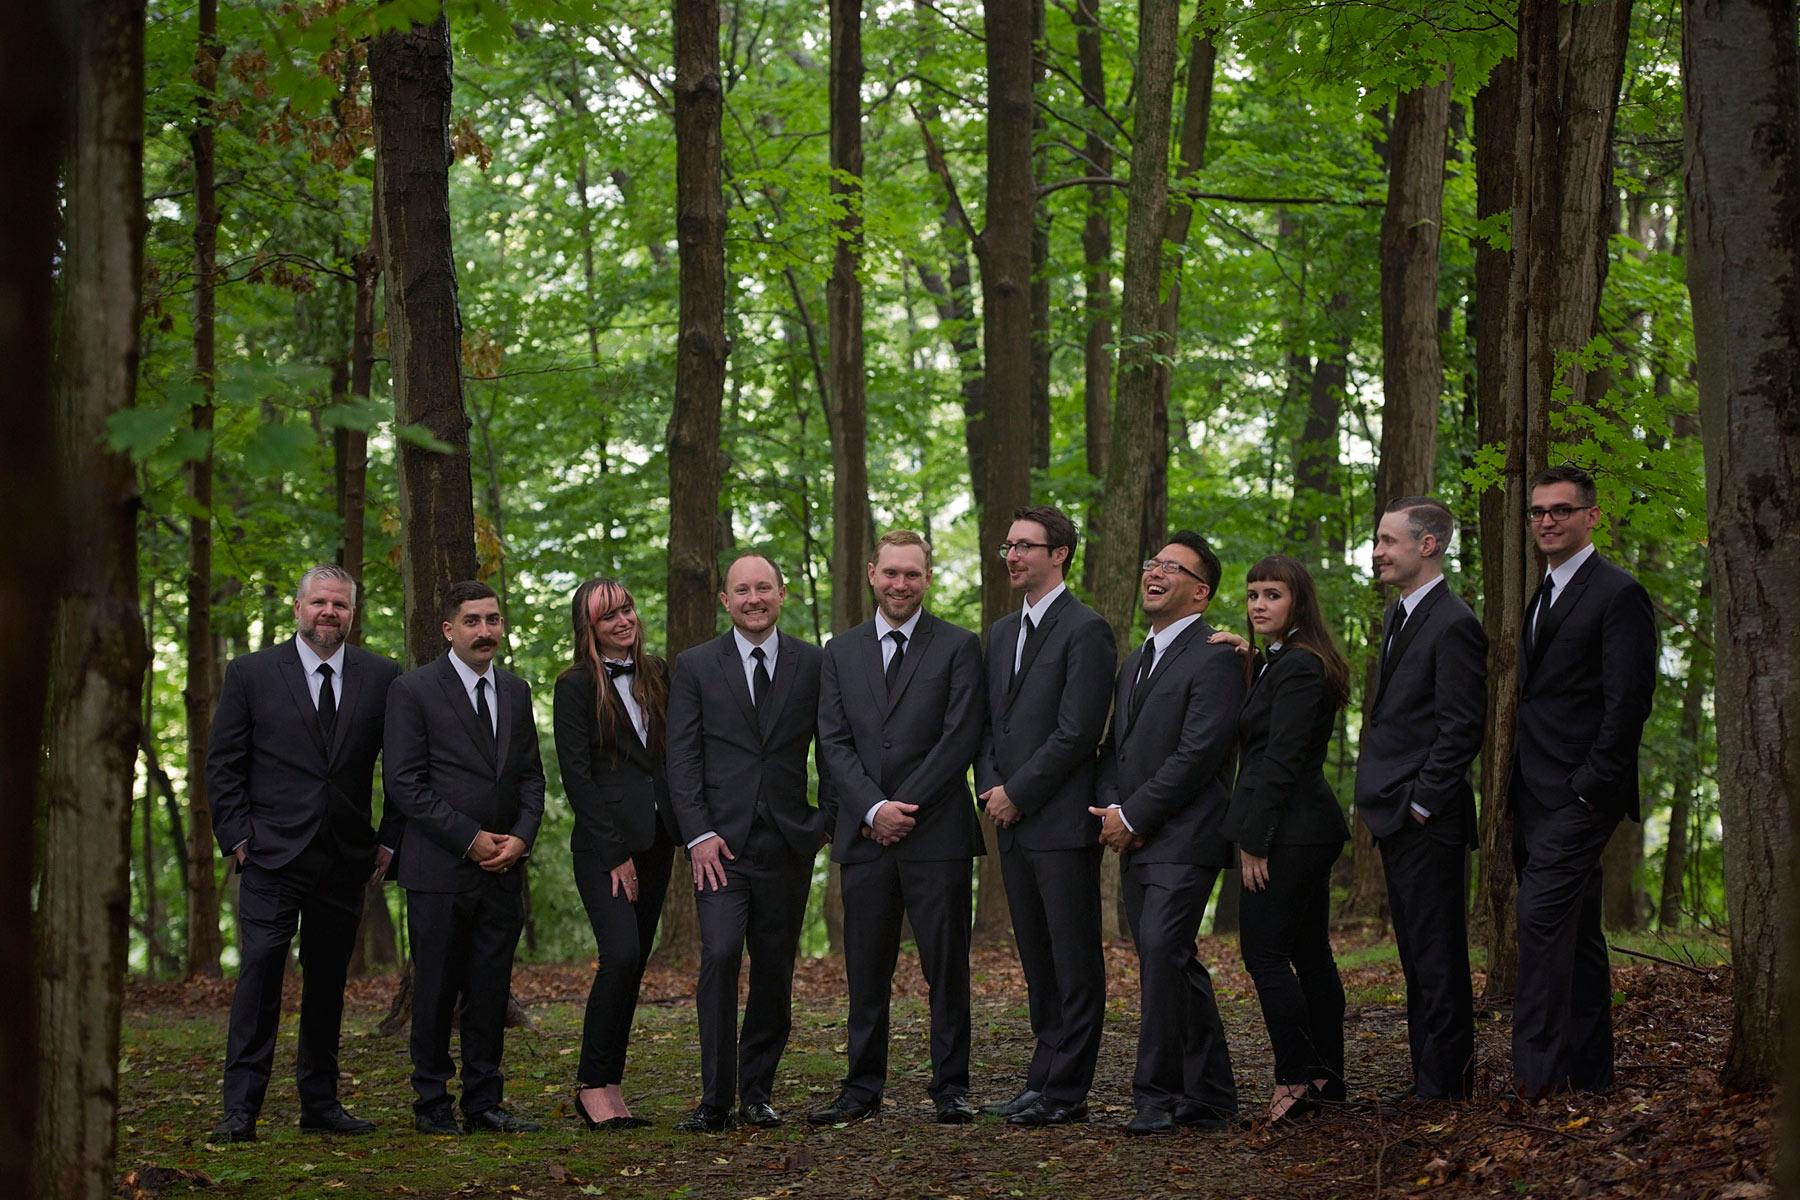 Bucks_County_wedding_photographer_Stroudsmoor_country_inn_wedding_Philadelphia_wedding_photographer_23_groomsfolk.JPG